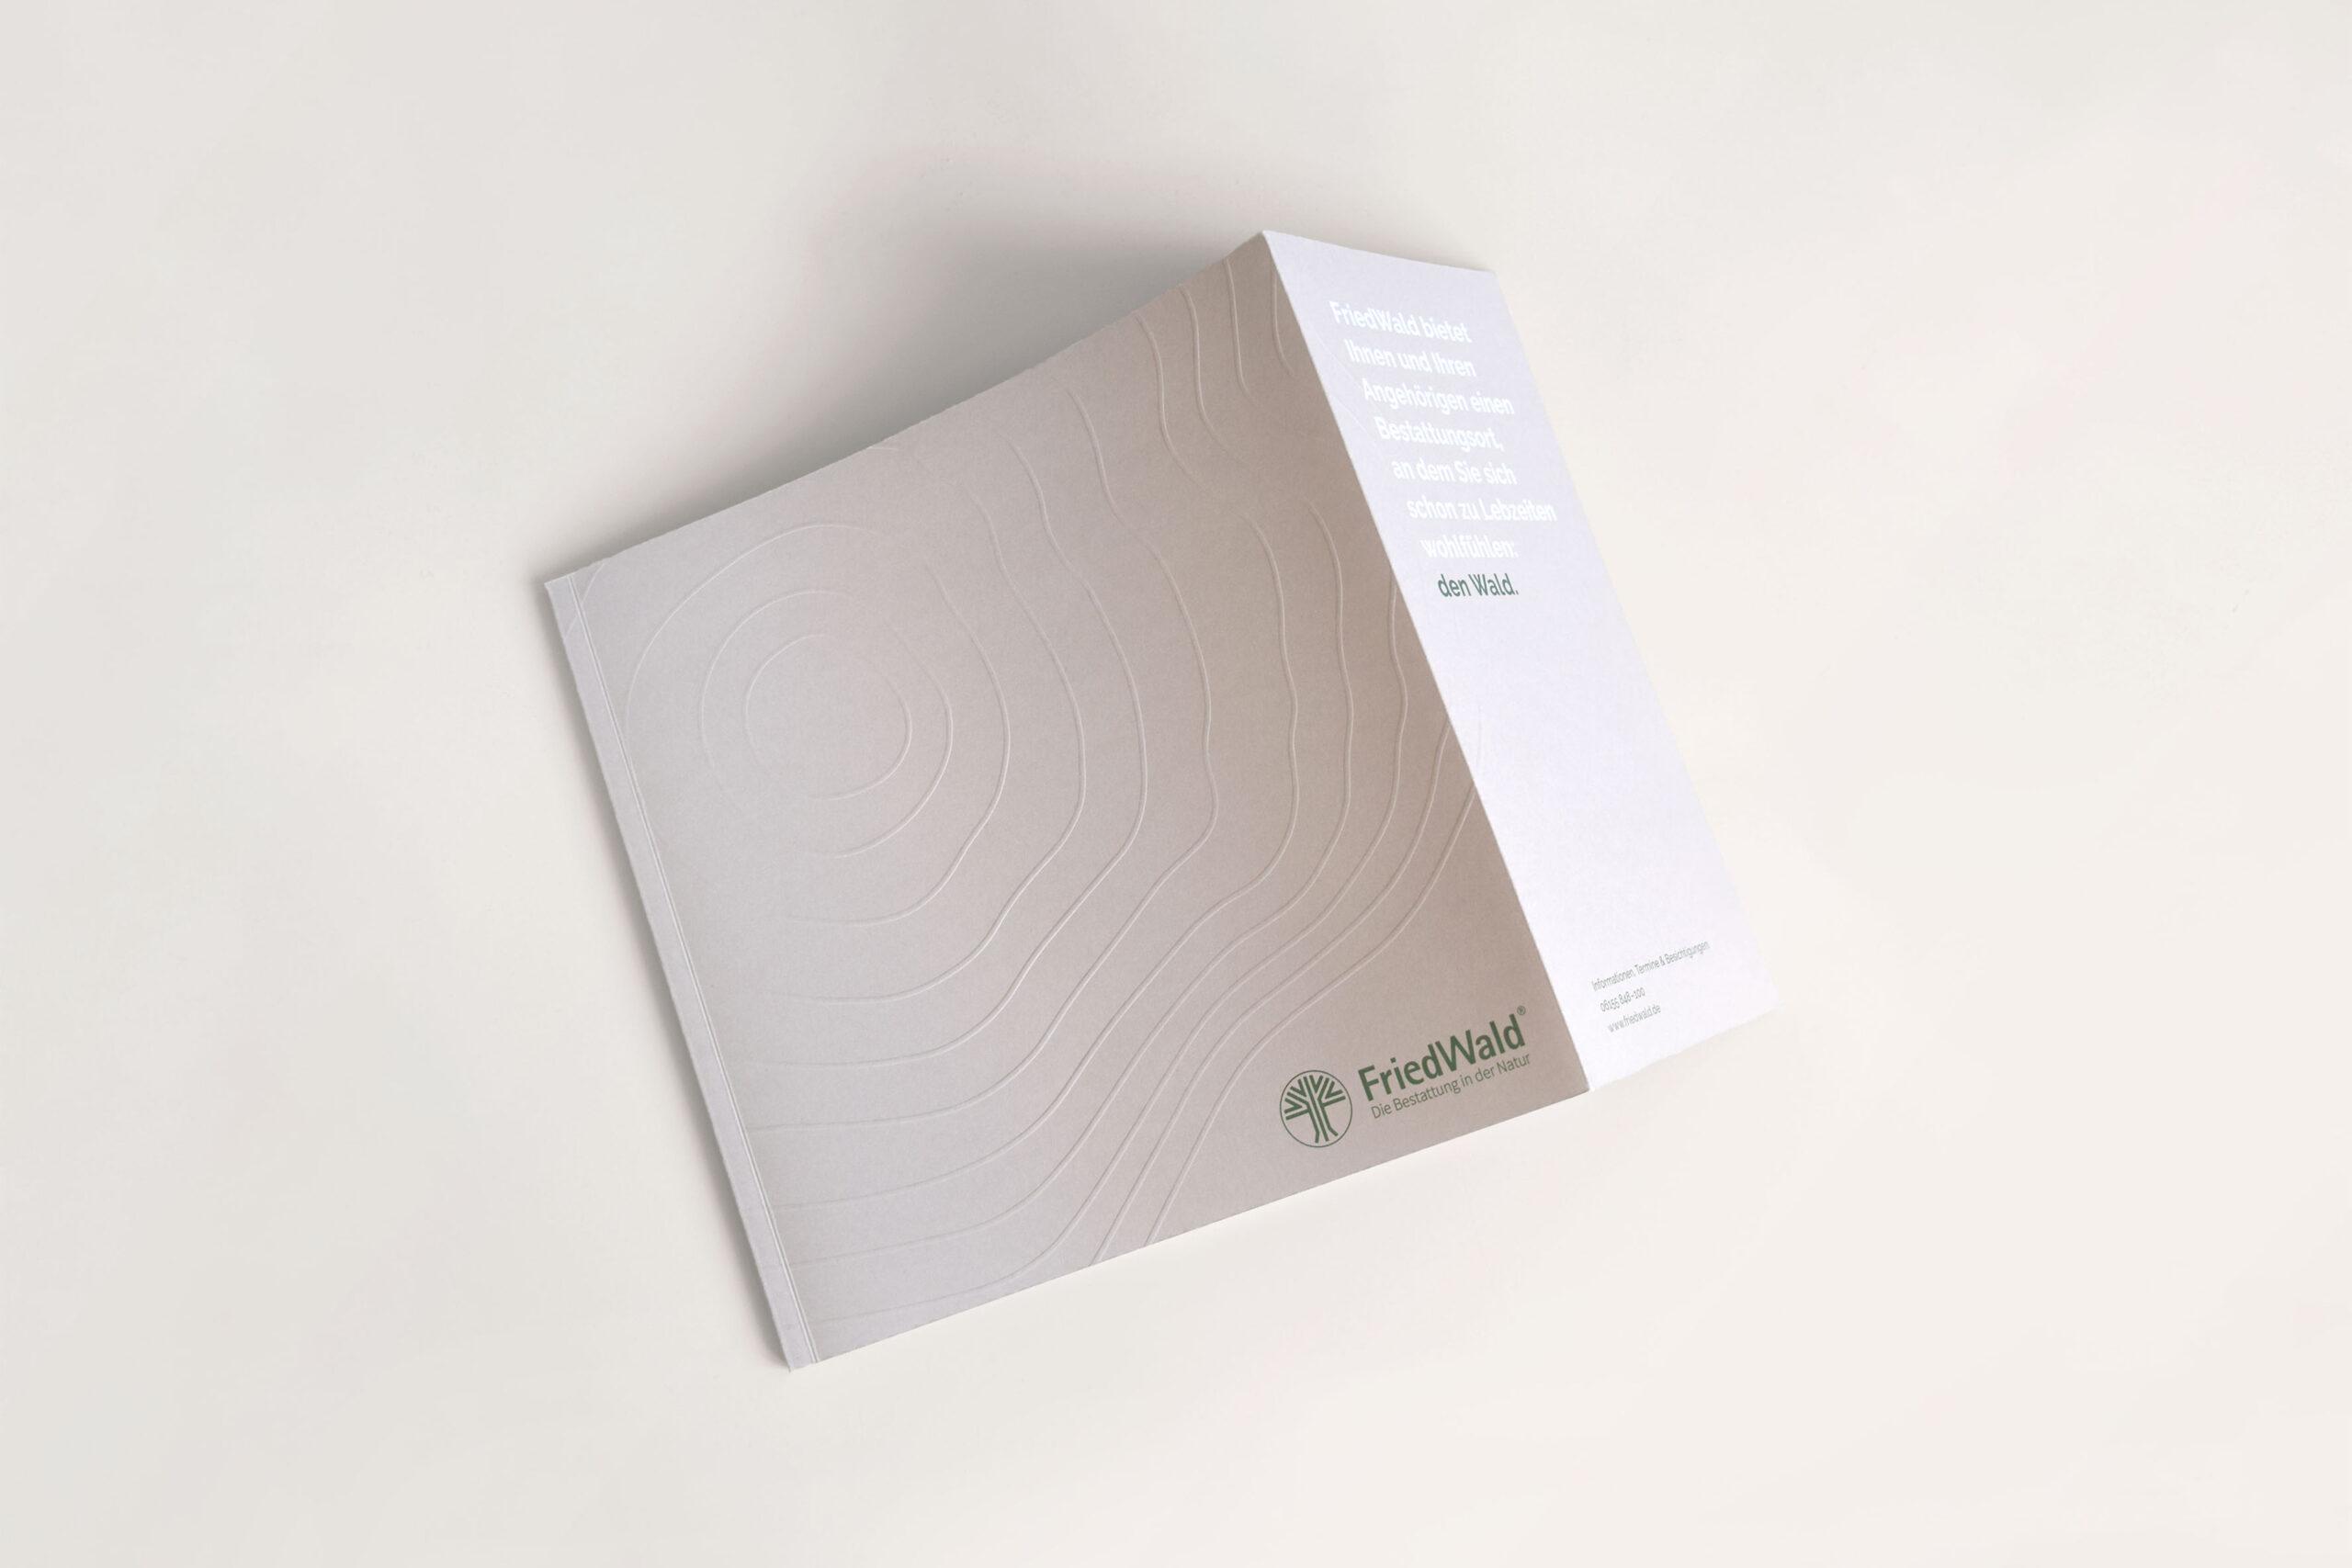 Case-Study-FriedWald-Material_Imagebroschuere-04_cropped